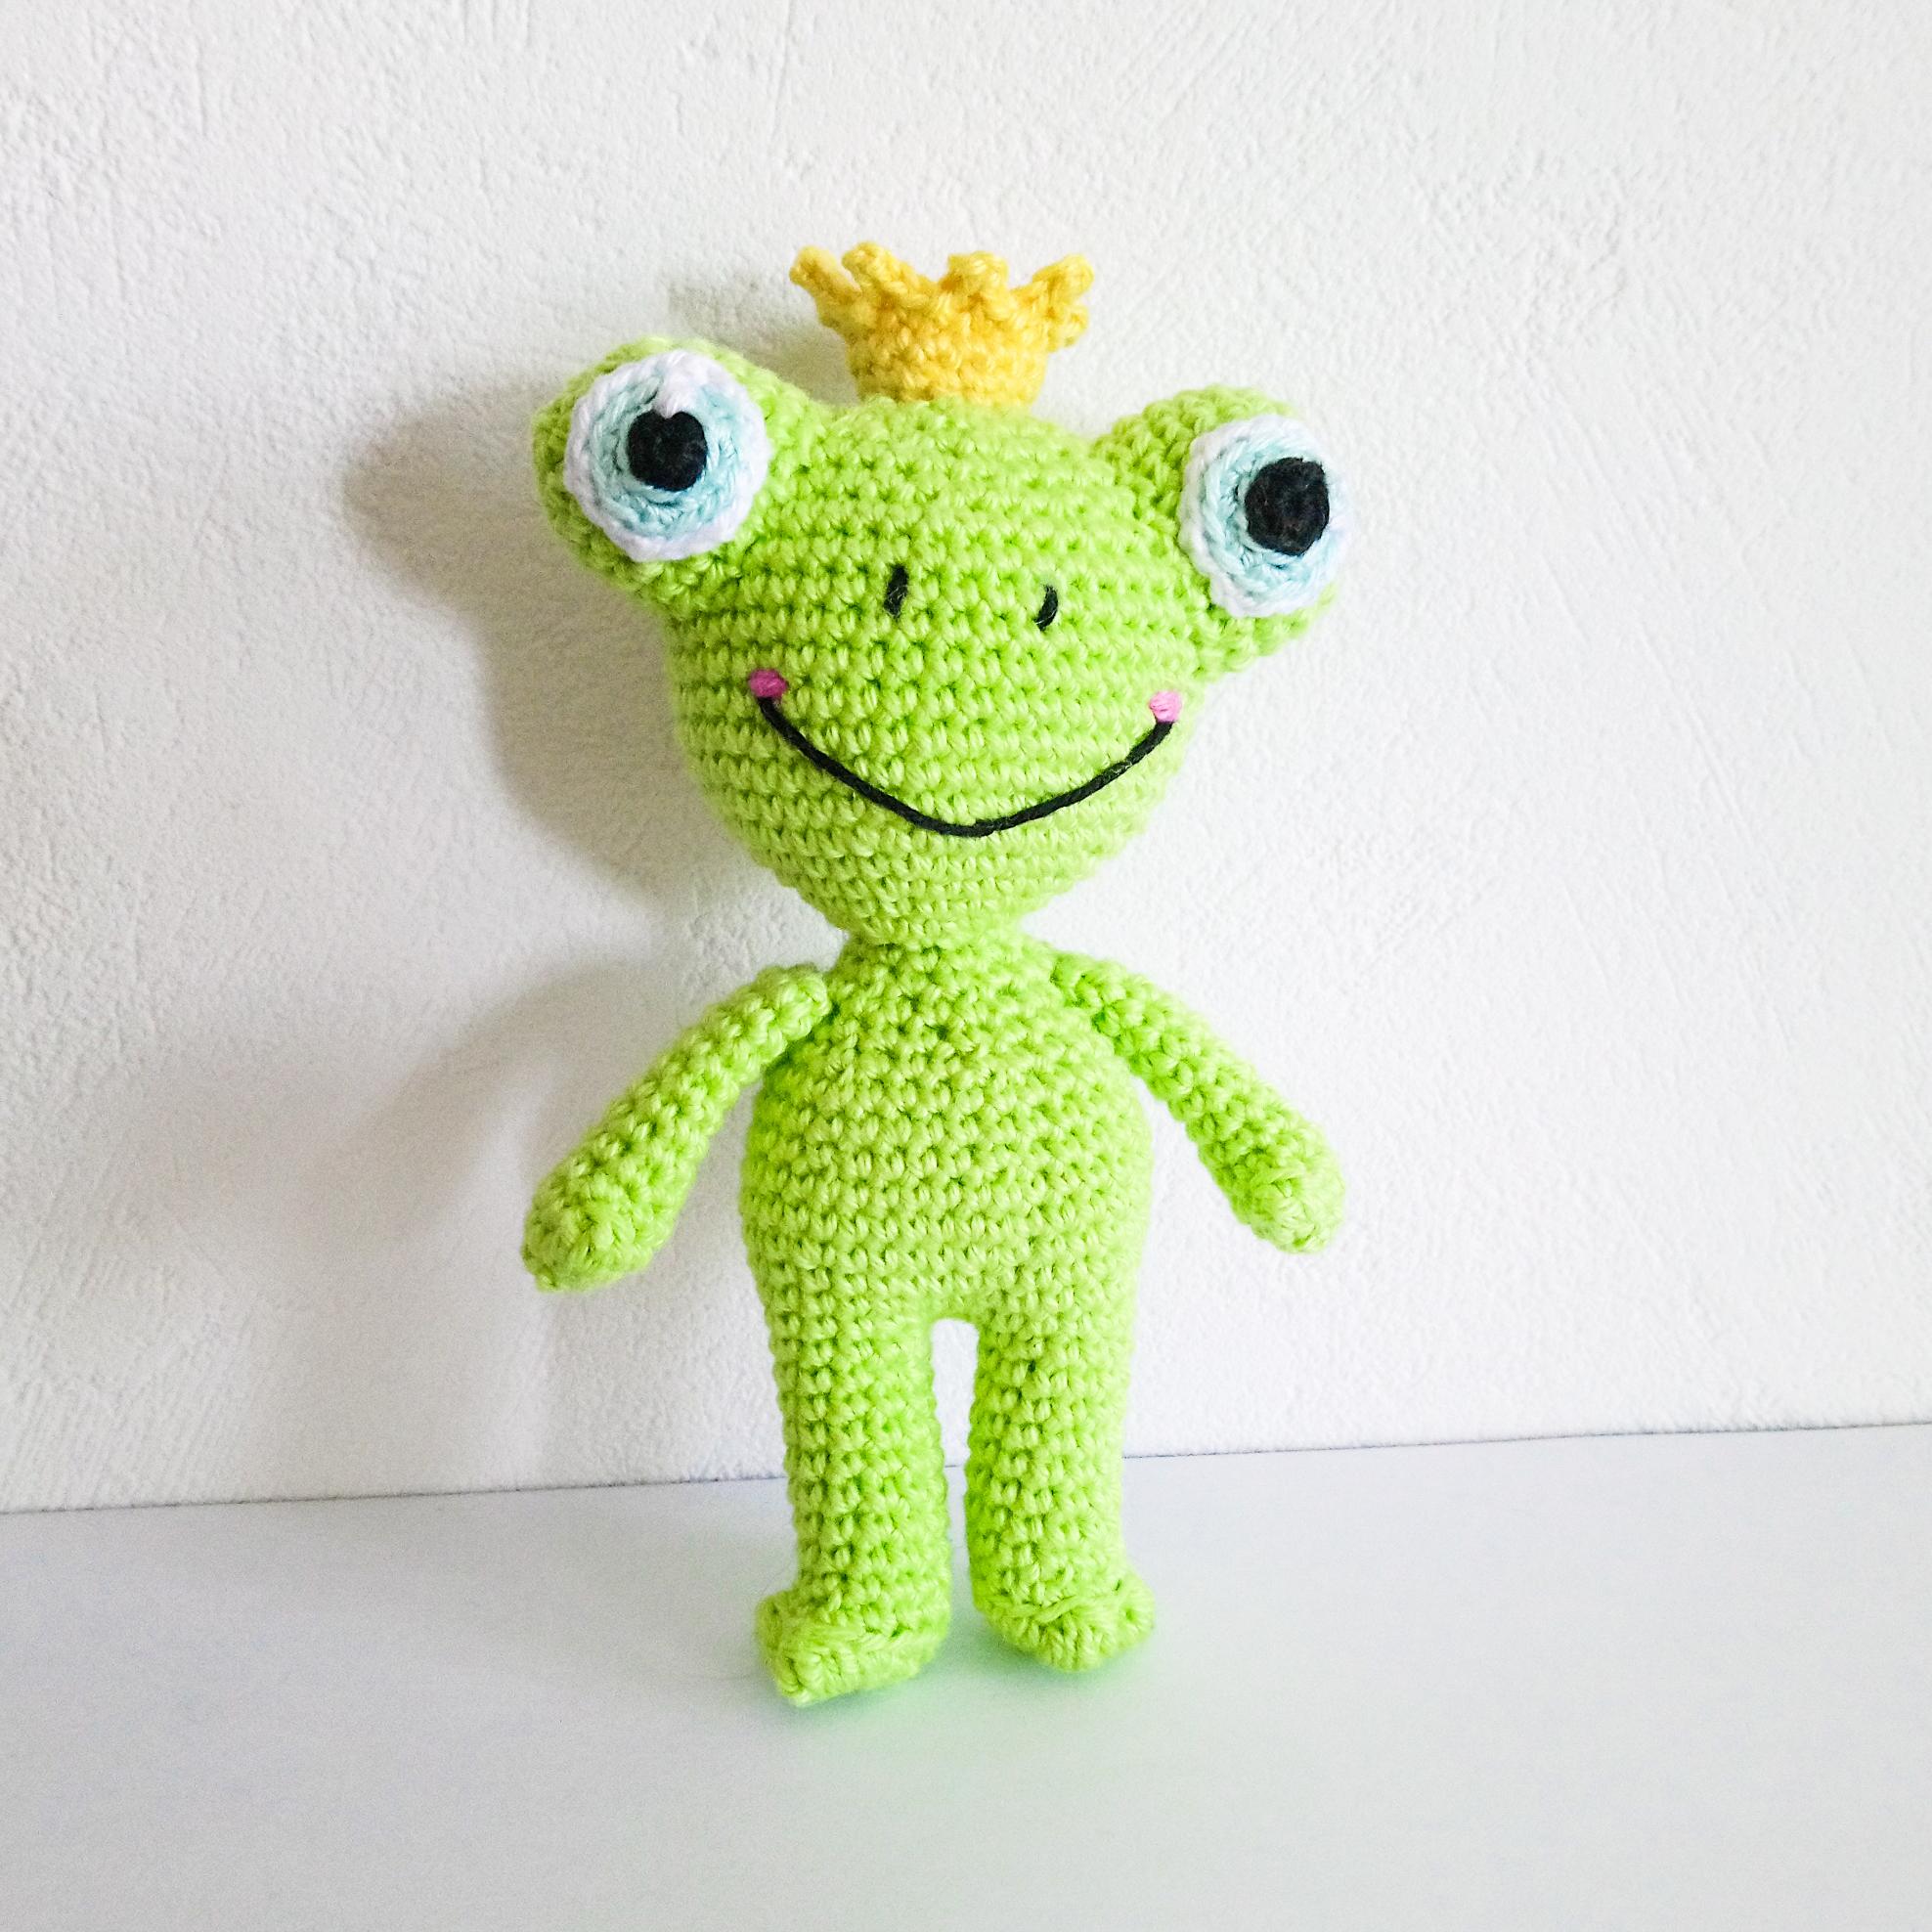 Todd The Frog - Amigurumi Crochet Pattern